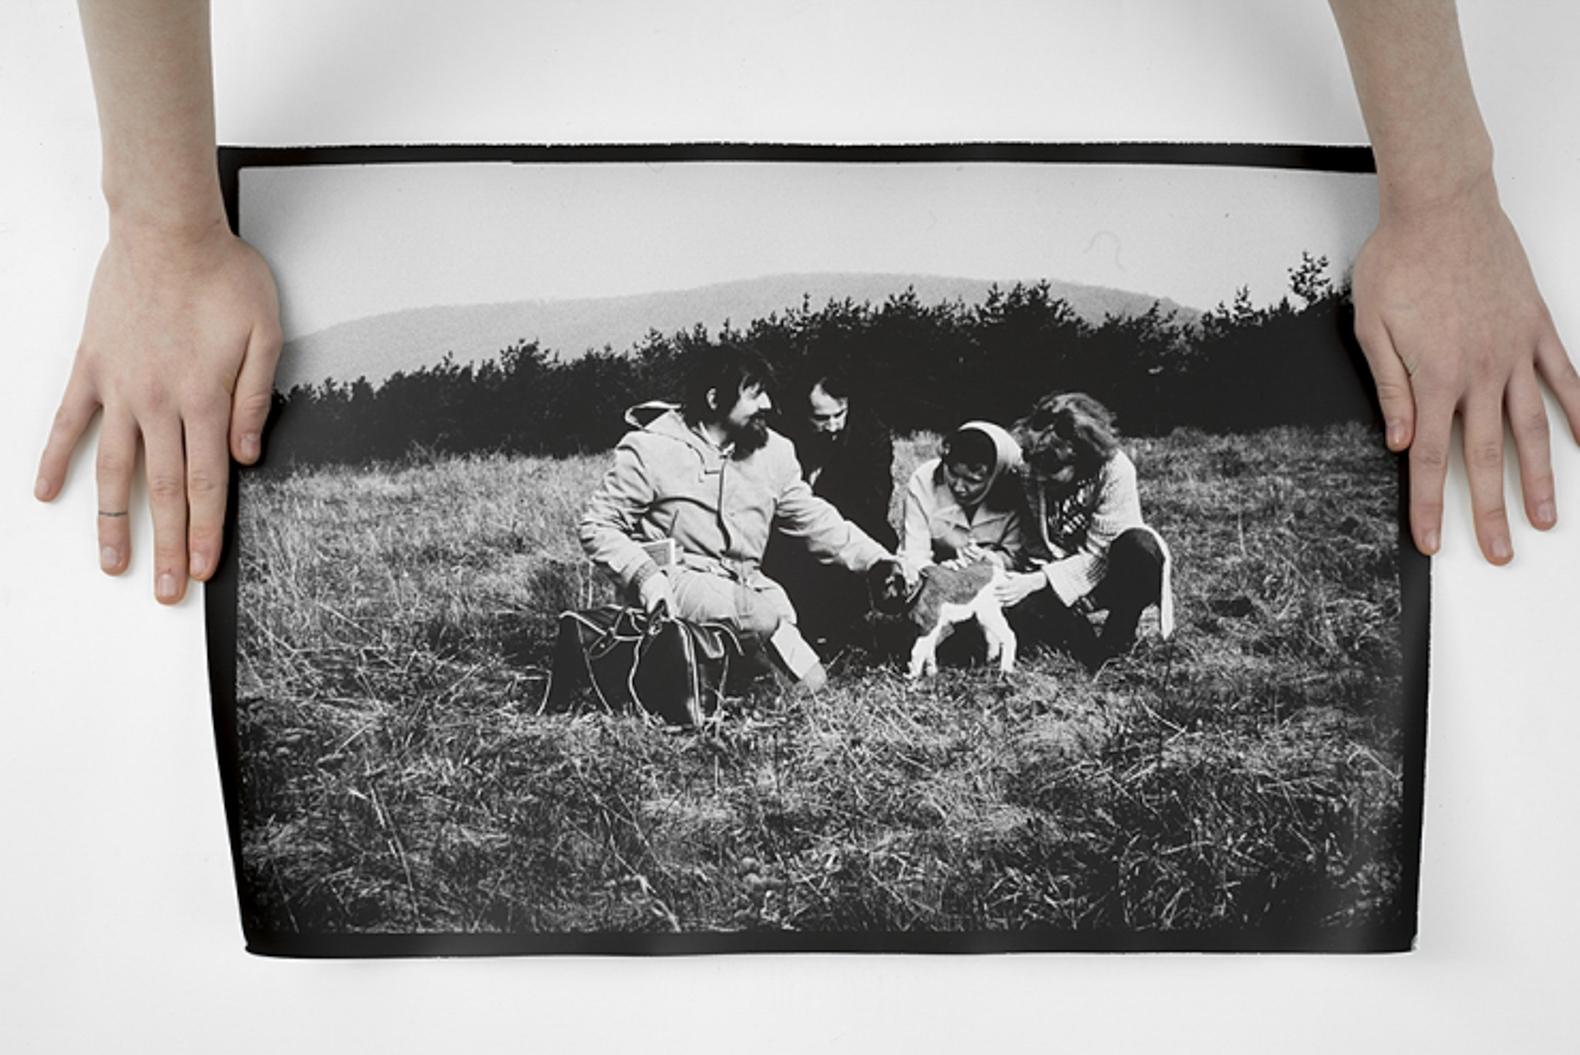 Peter Bartoš and Petra Feriancocá, Grazing a Lamb, 1979/2016 – original photos from the archive of Květa Fulierová